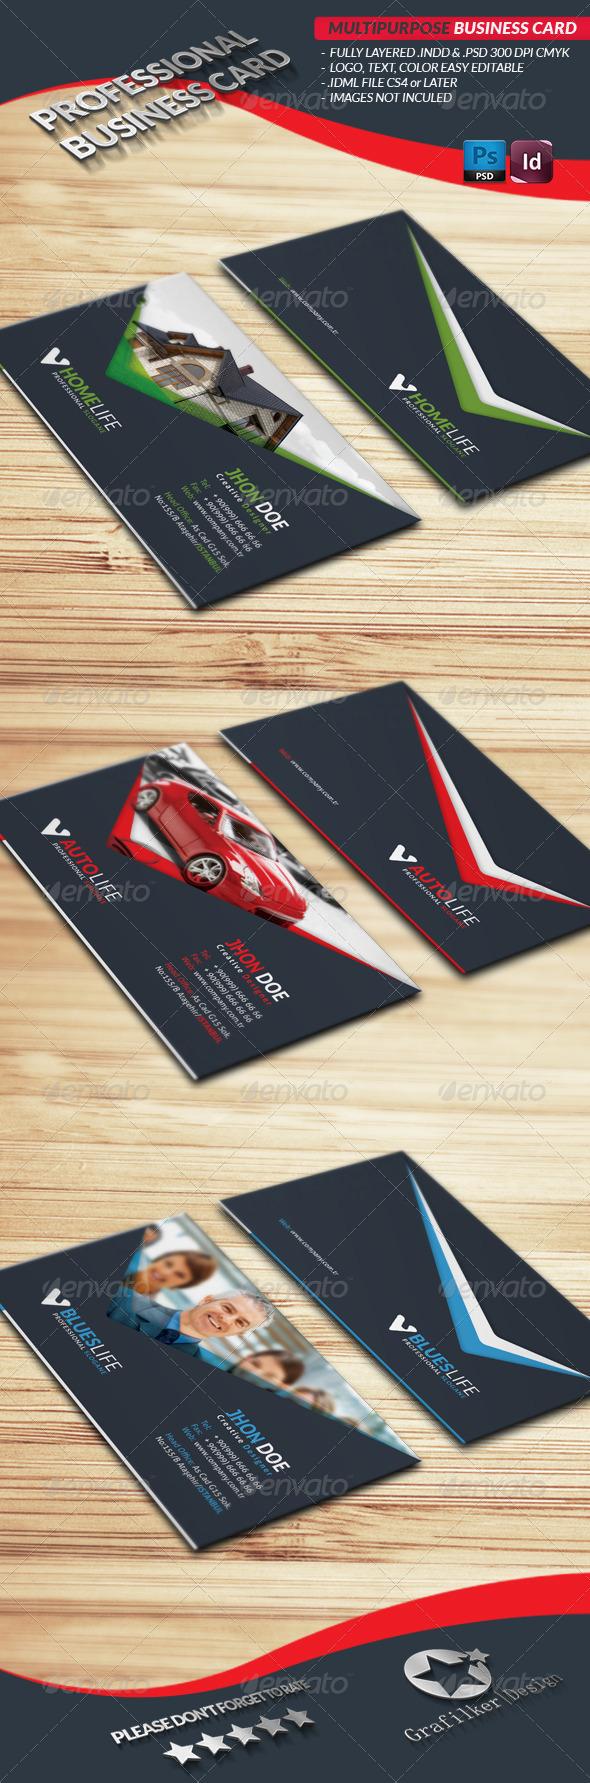 GraphicRiver Multipurpose Business Card 4030109